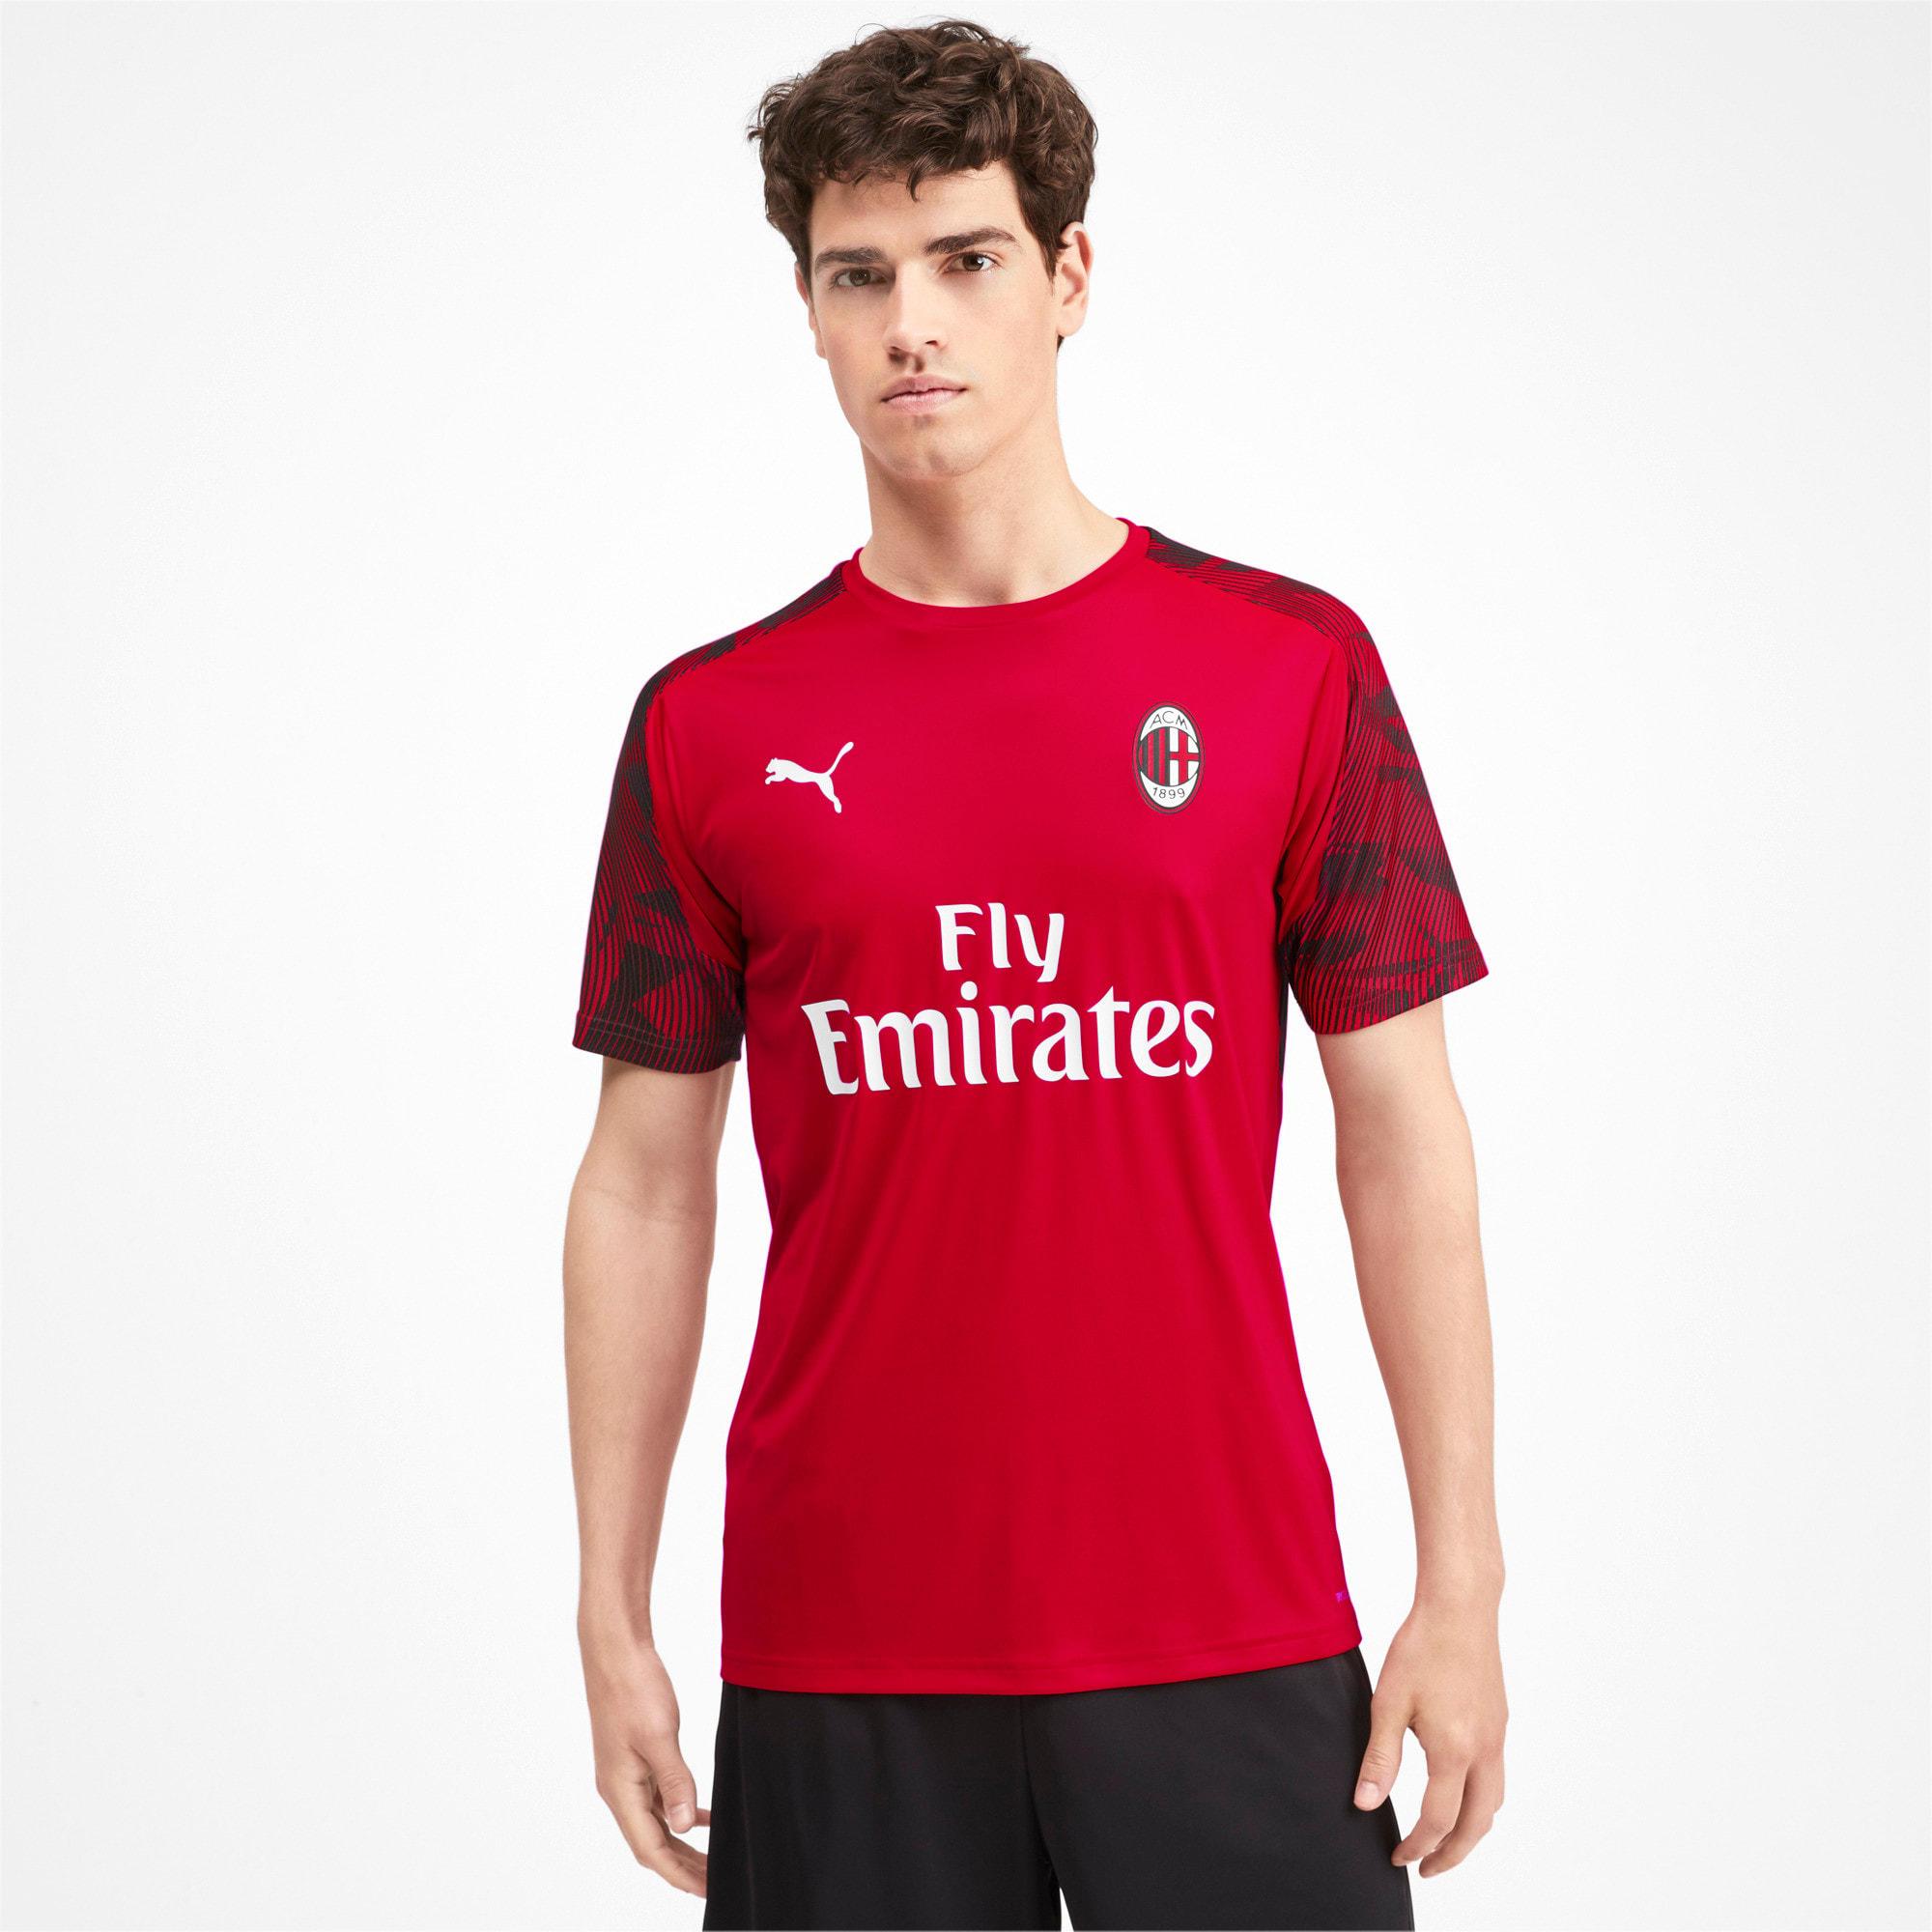 Thumbnail 1 of AC Milan Short Sleeve Men's Training Jersey, Tango Red -Puma Black, medium